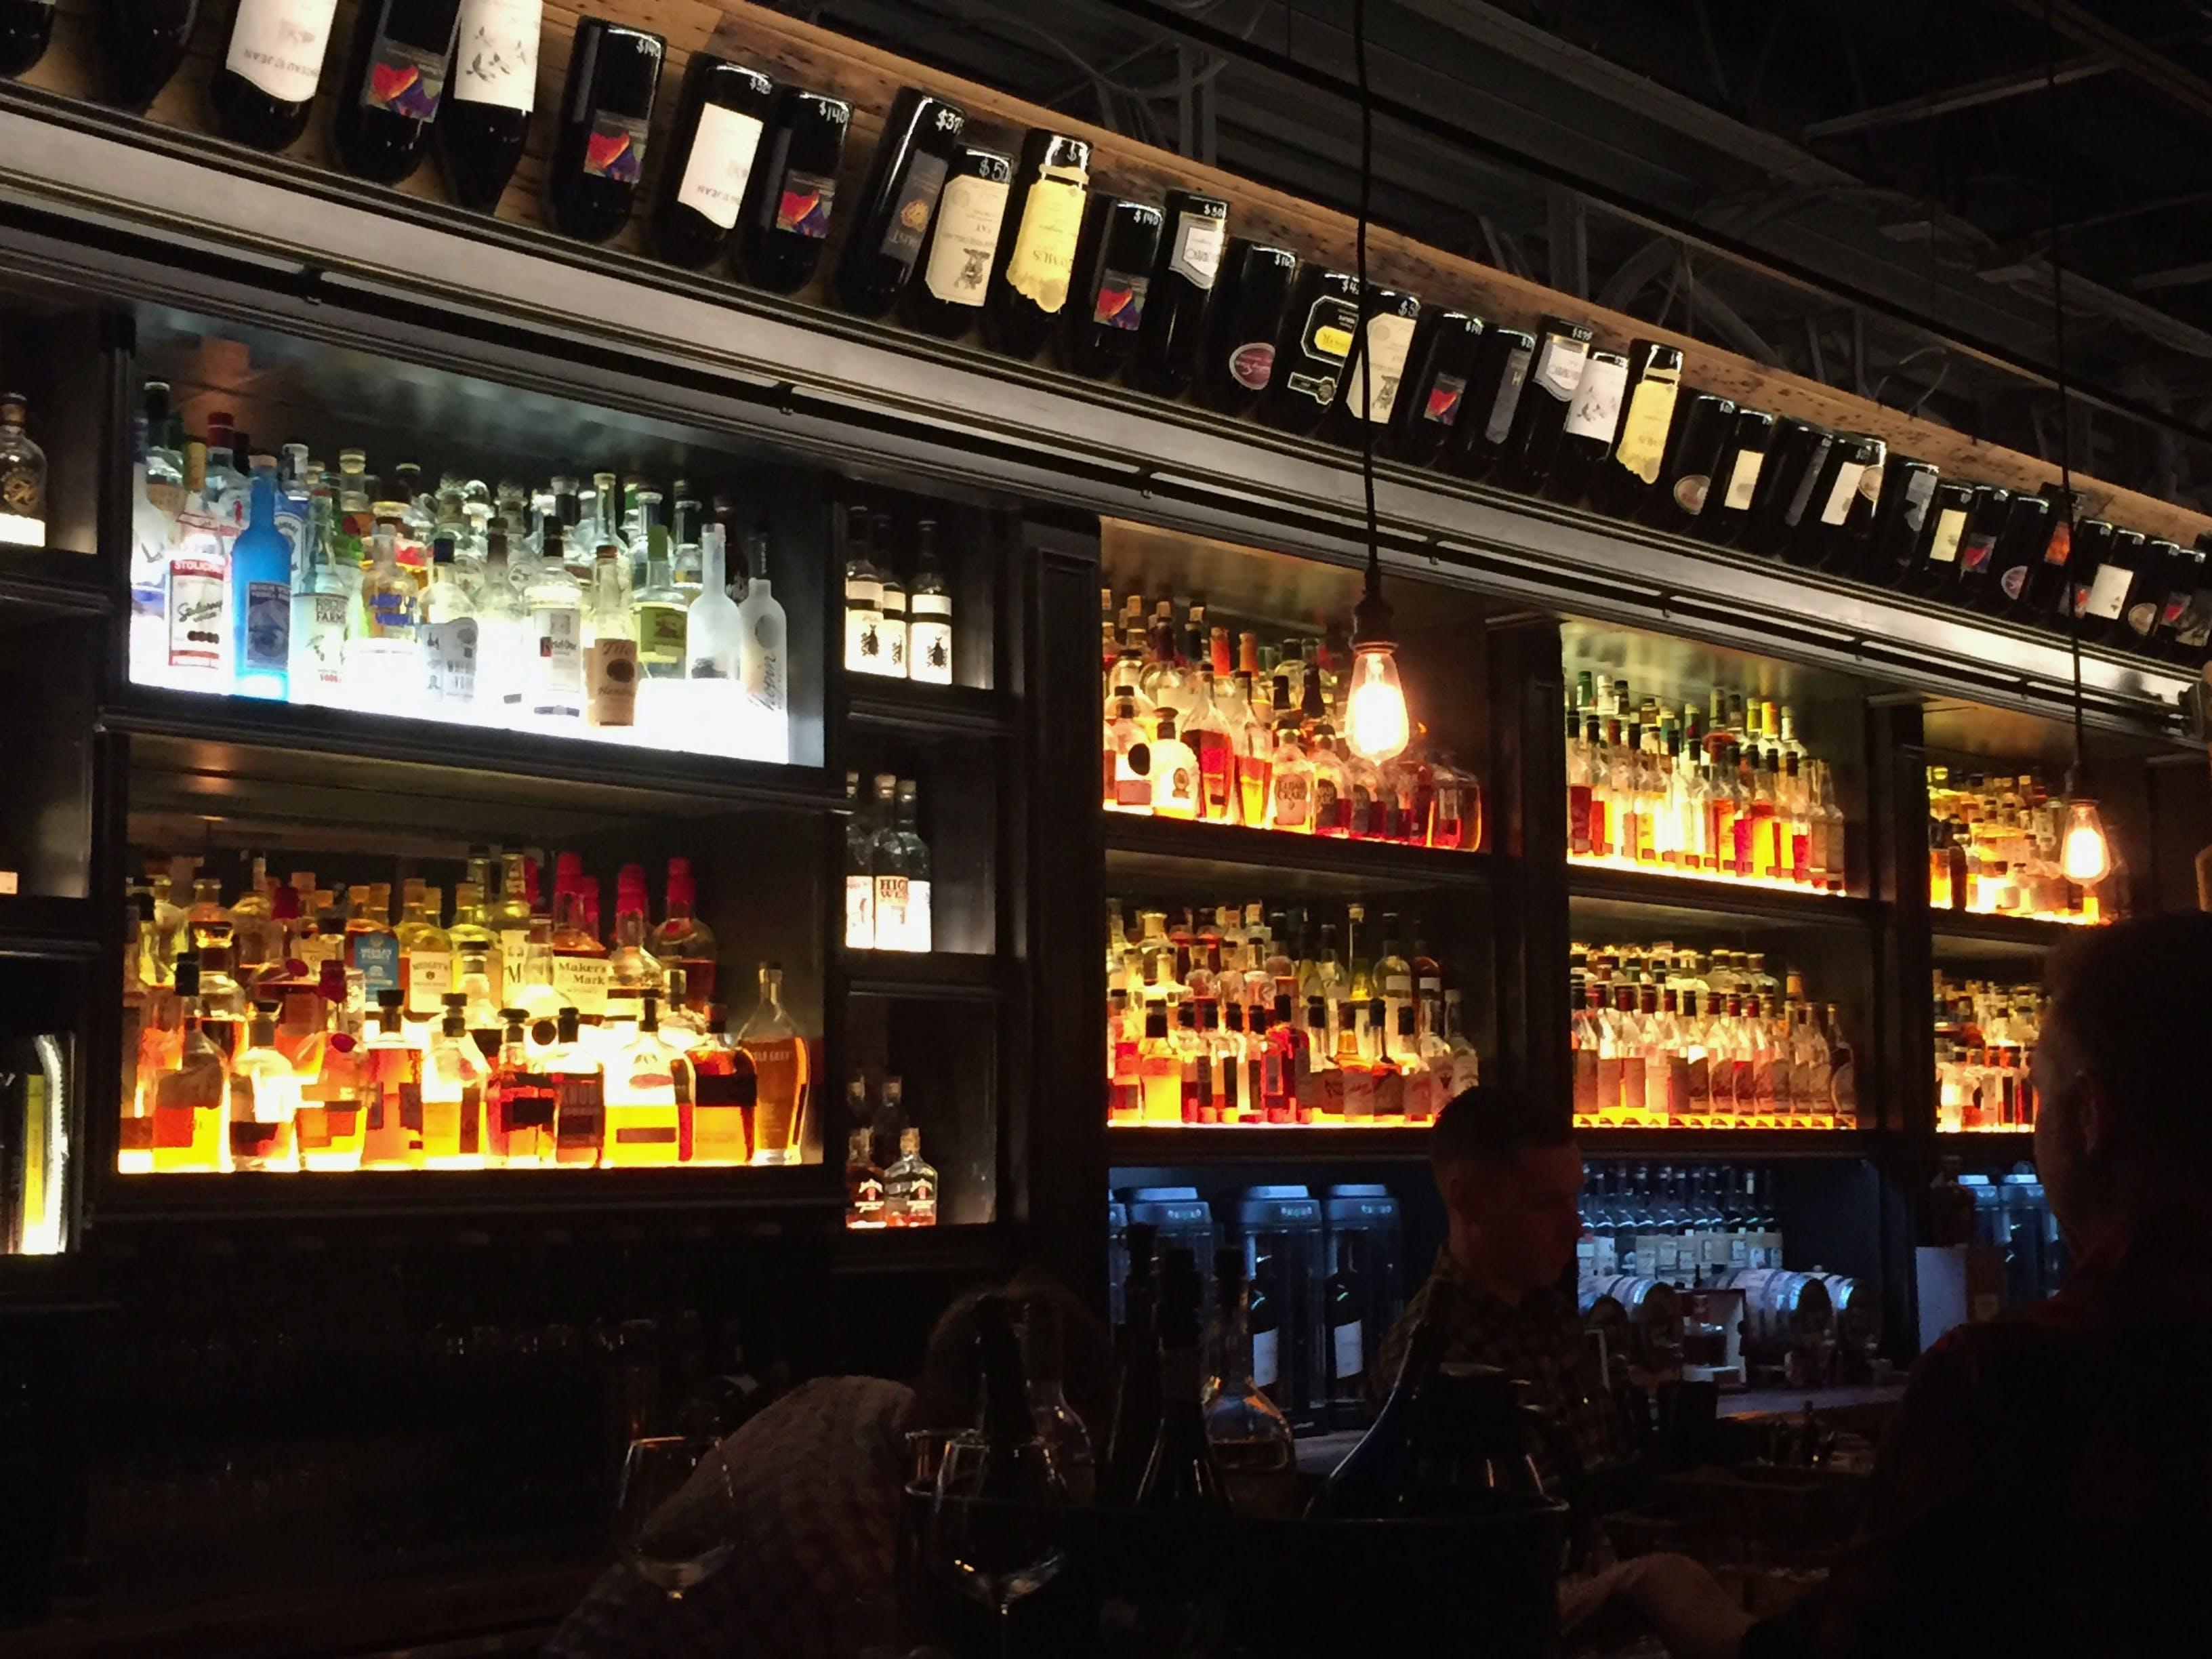 Free stock photo of alcohol, alcohol bottles, alcoholic beverages, bar